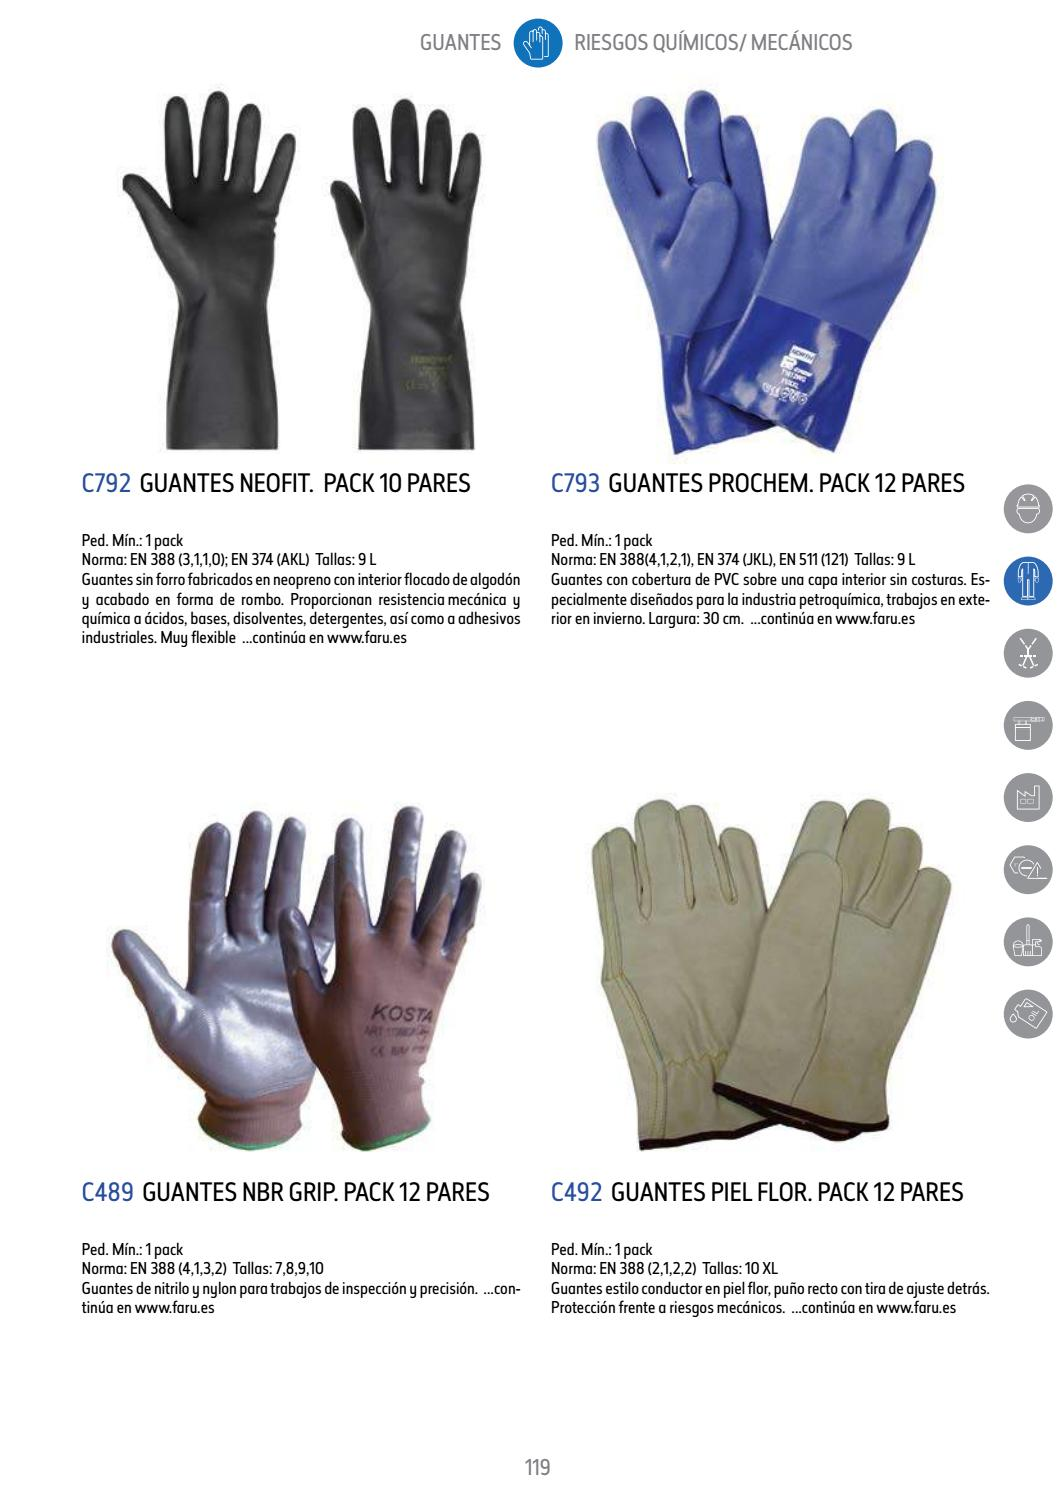 ba8a0d6ea12 EPIS y Uniformes ICOM Textil Catalogo FARU EPIS SEGURIDAD by ICOM  Multiservicios - issuu